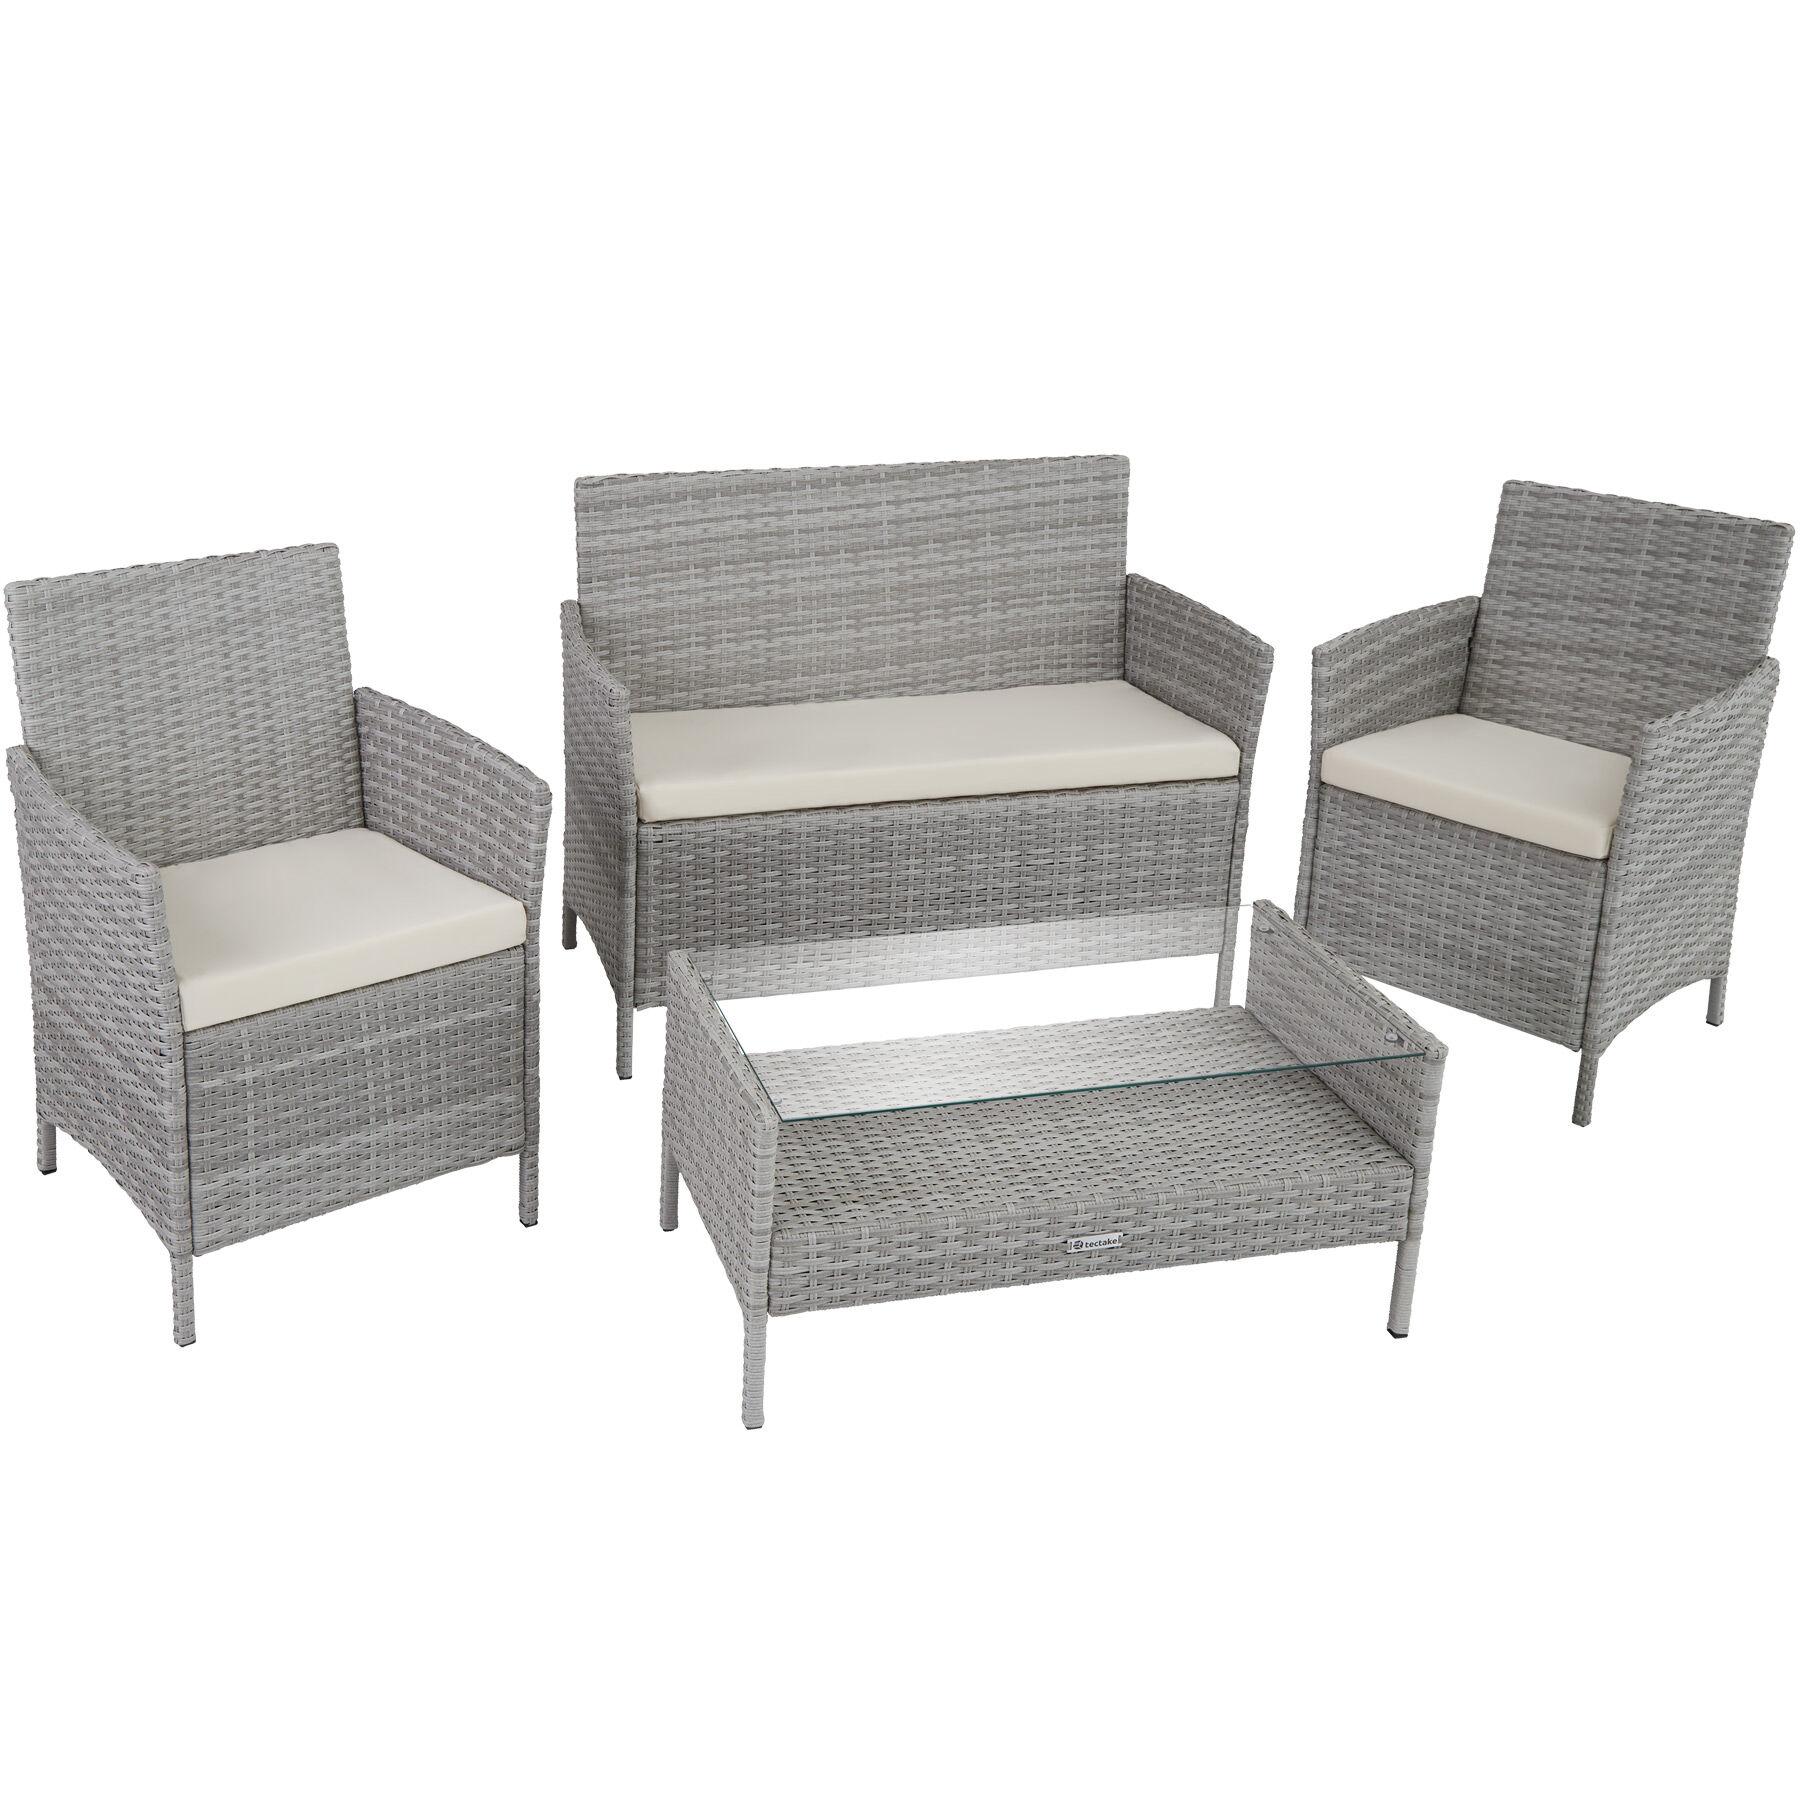 tectake set da giardino in rattan madeira - grigio chiaro